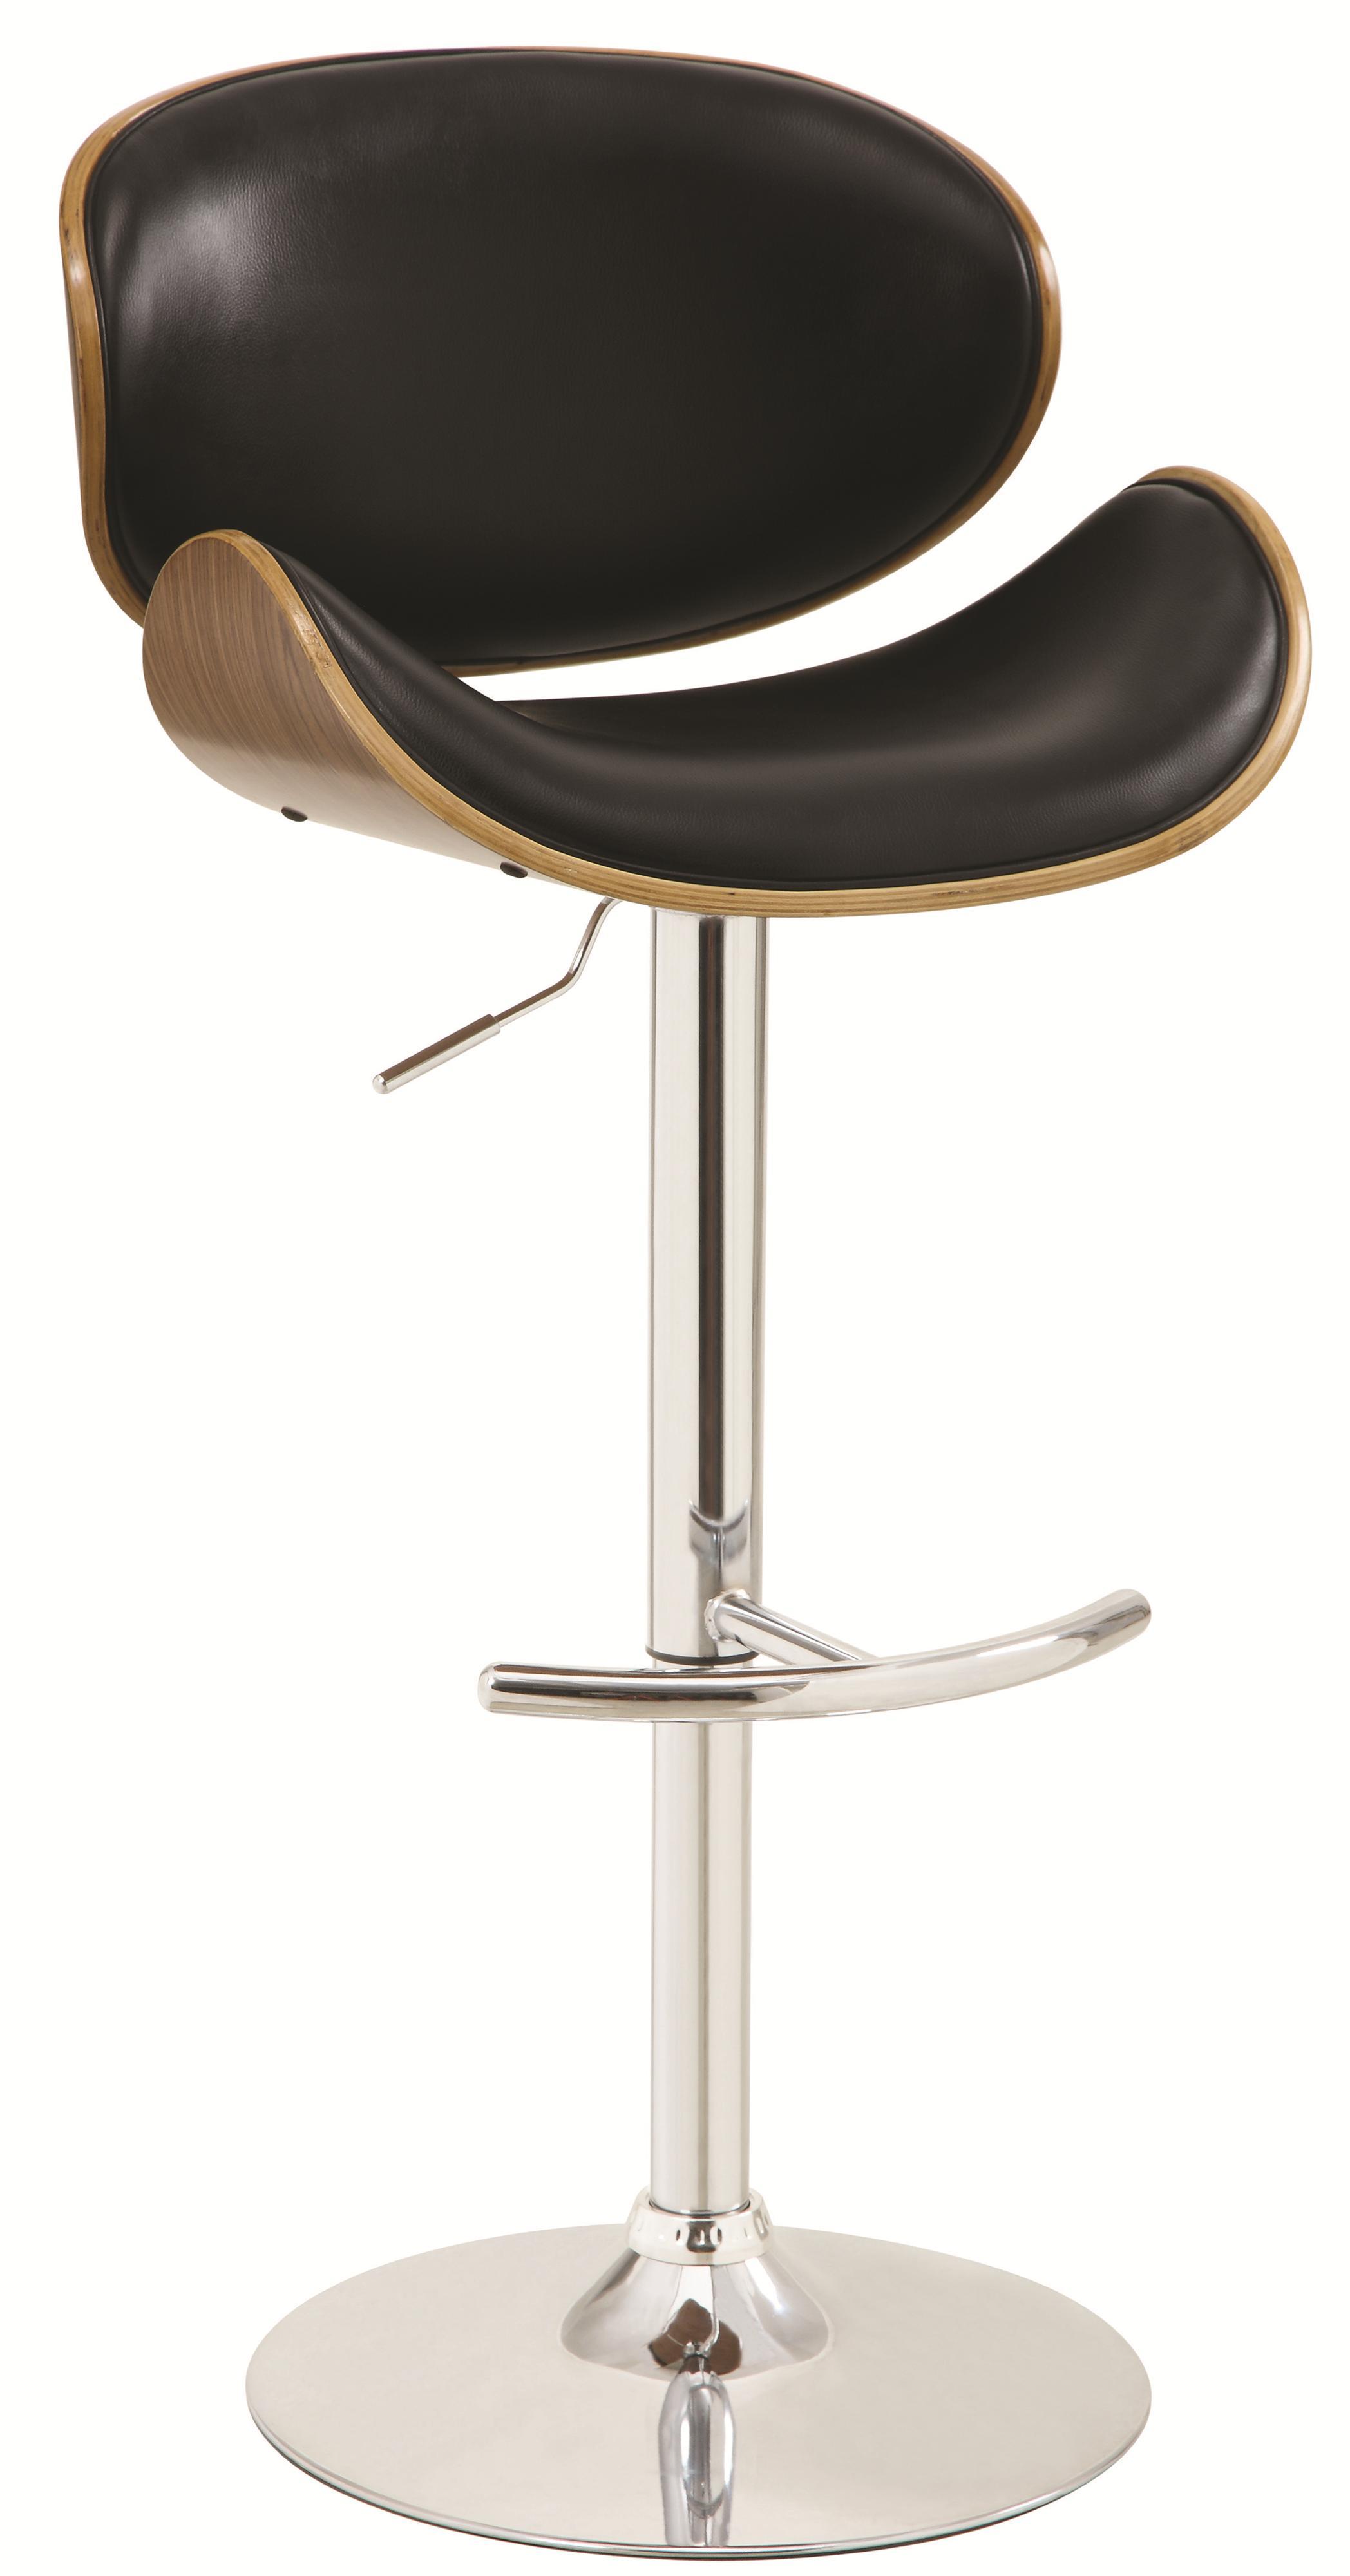 Bar Units and Bar Tables Adjustable Bar Stool by Coaster at Northeast Factory Direct